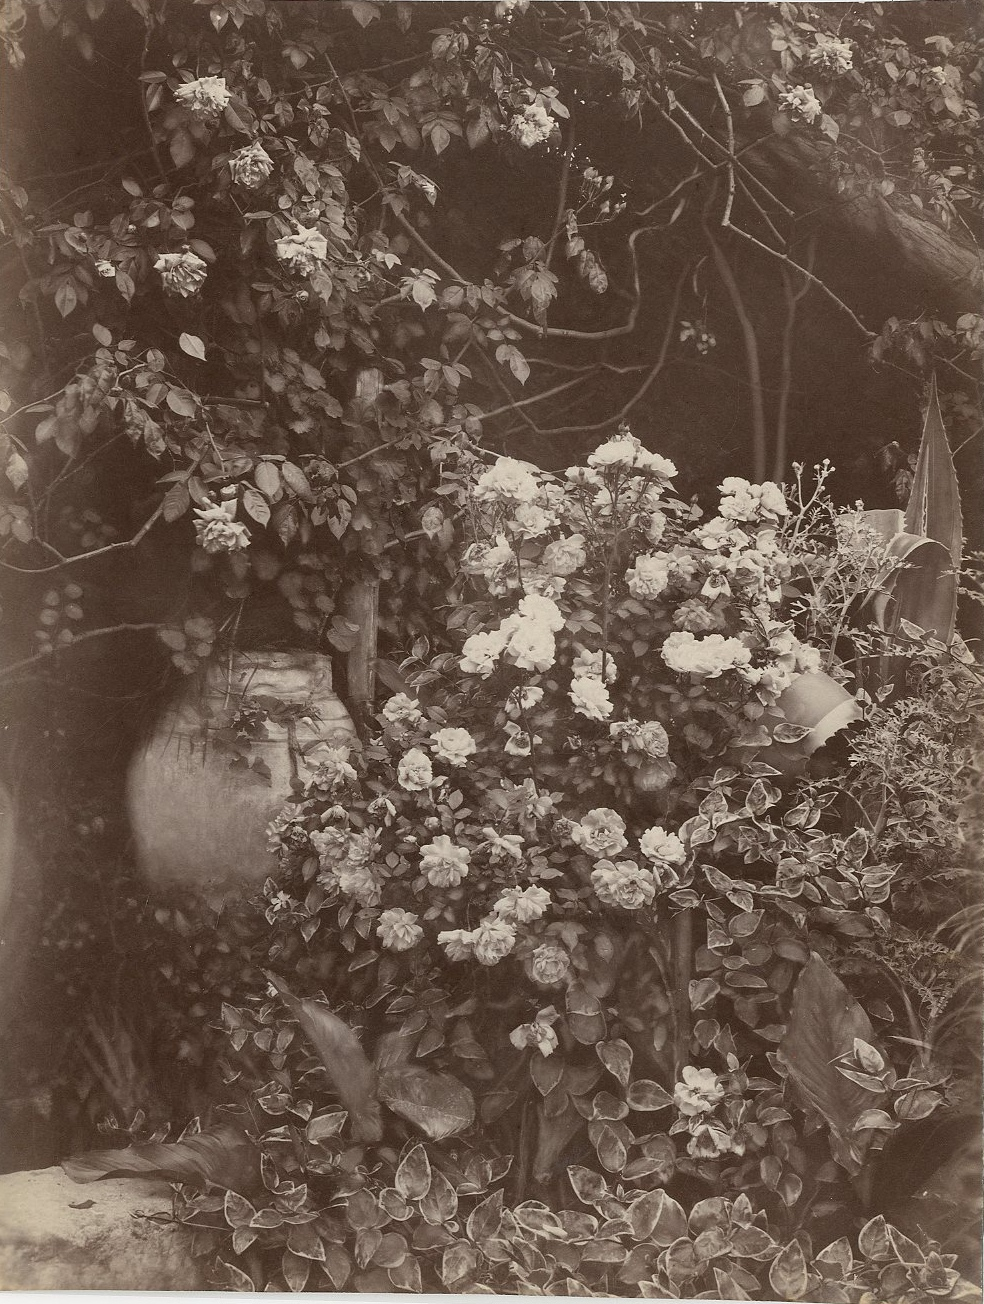 Fiori 94.File Gloeden Wilhelm Von 1856 1931 N 2594 Giara Con Fiori